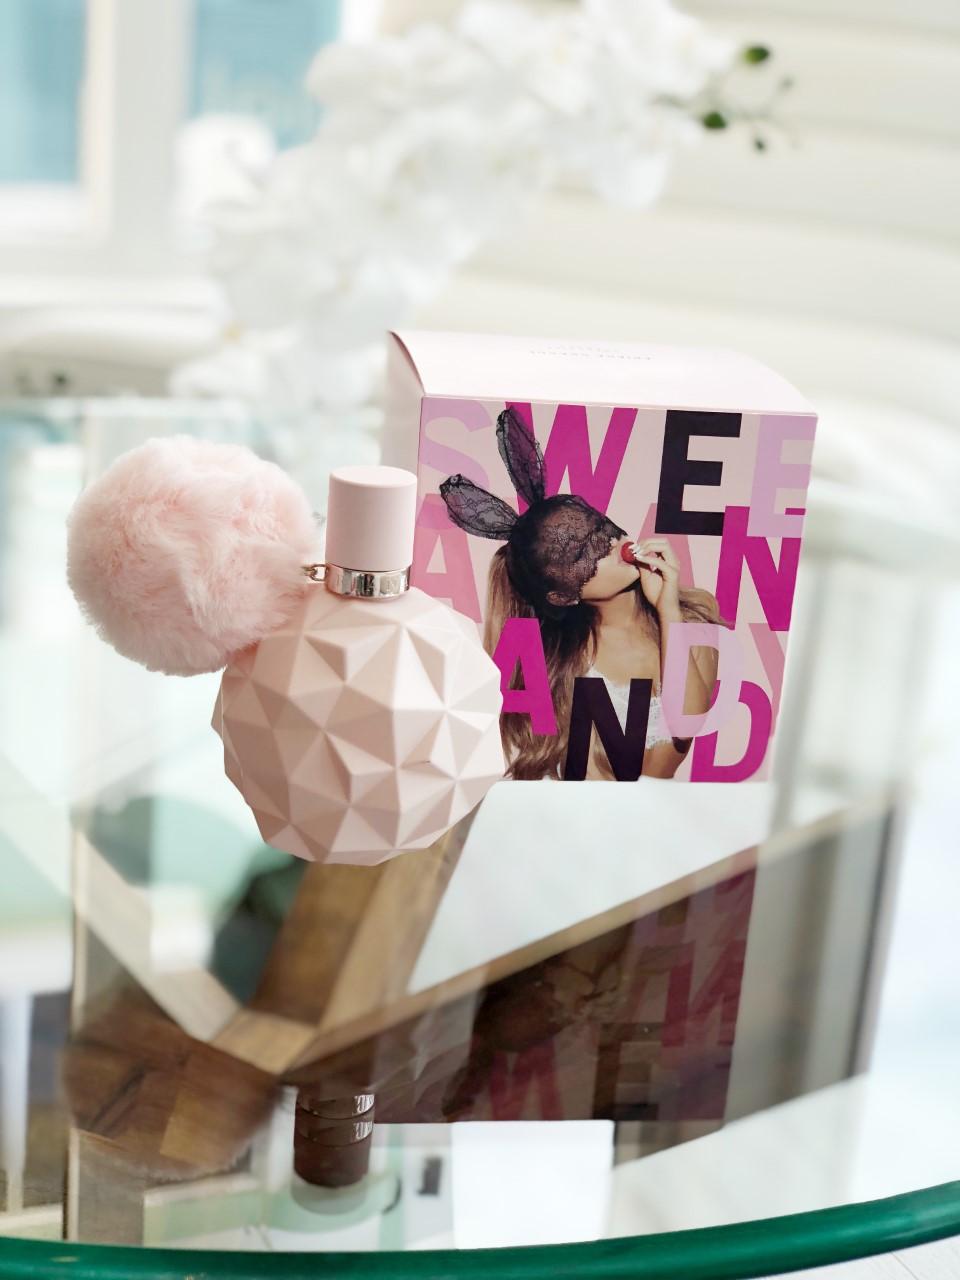 I love Ariana Grande!